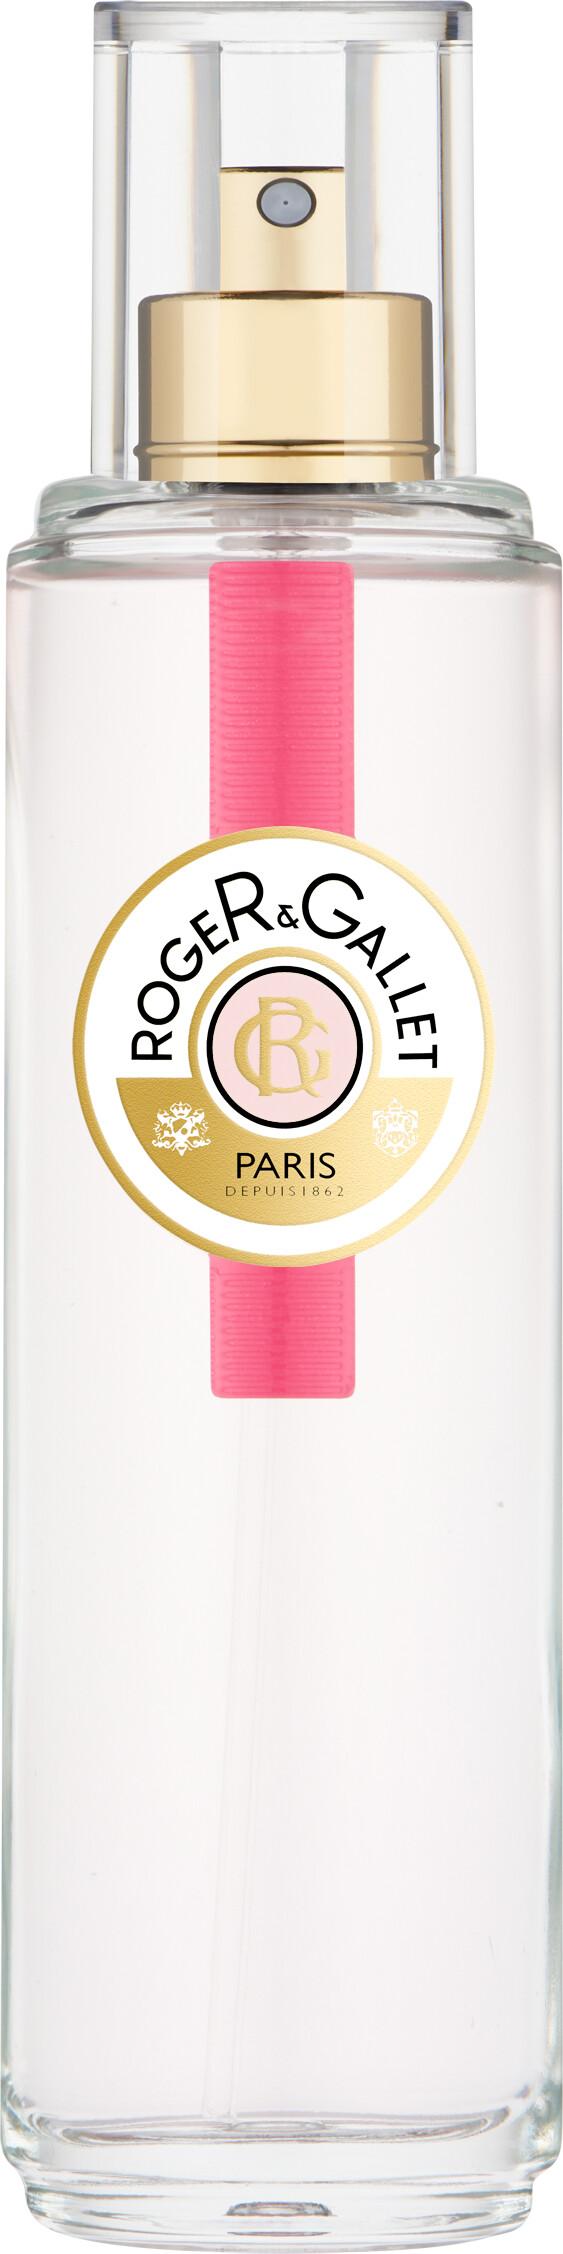 Roger & Gallet Rose Gentle Fragrant Water Spray 30ml